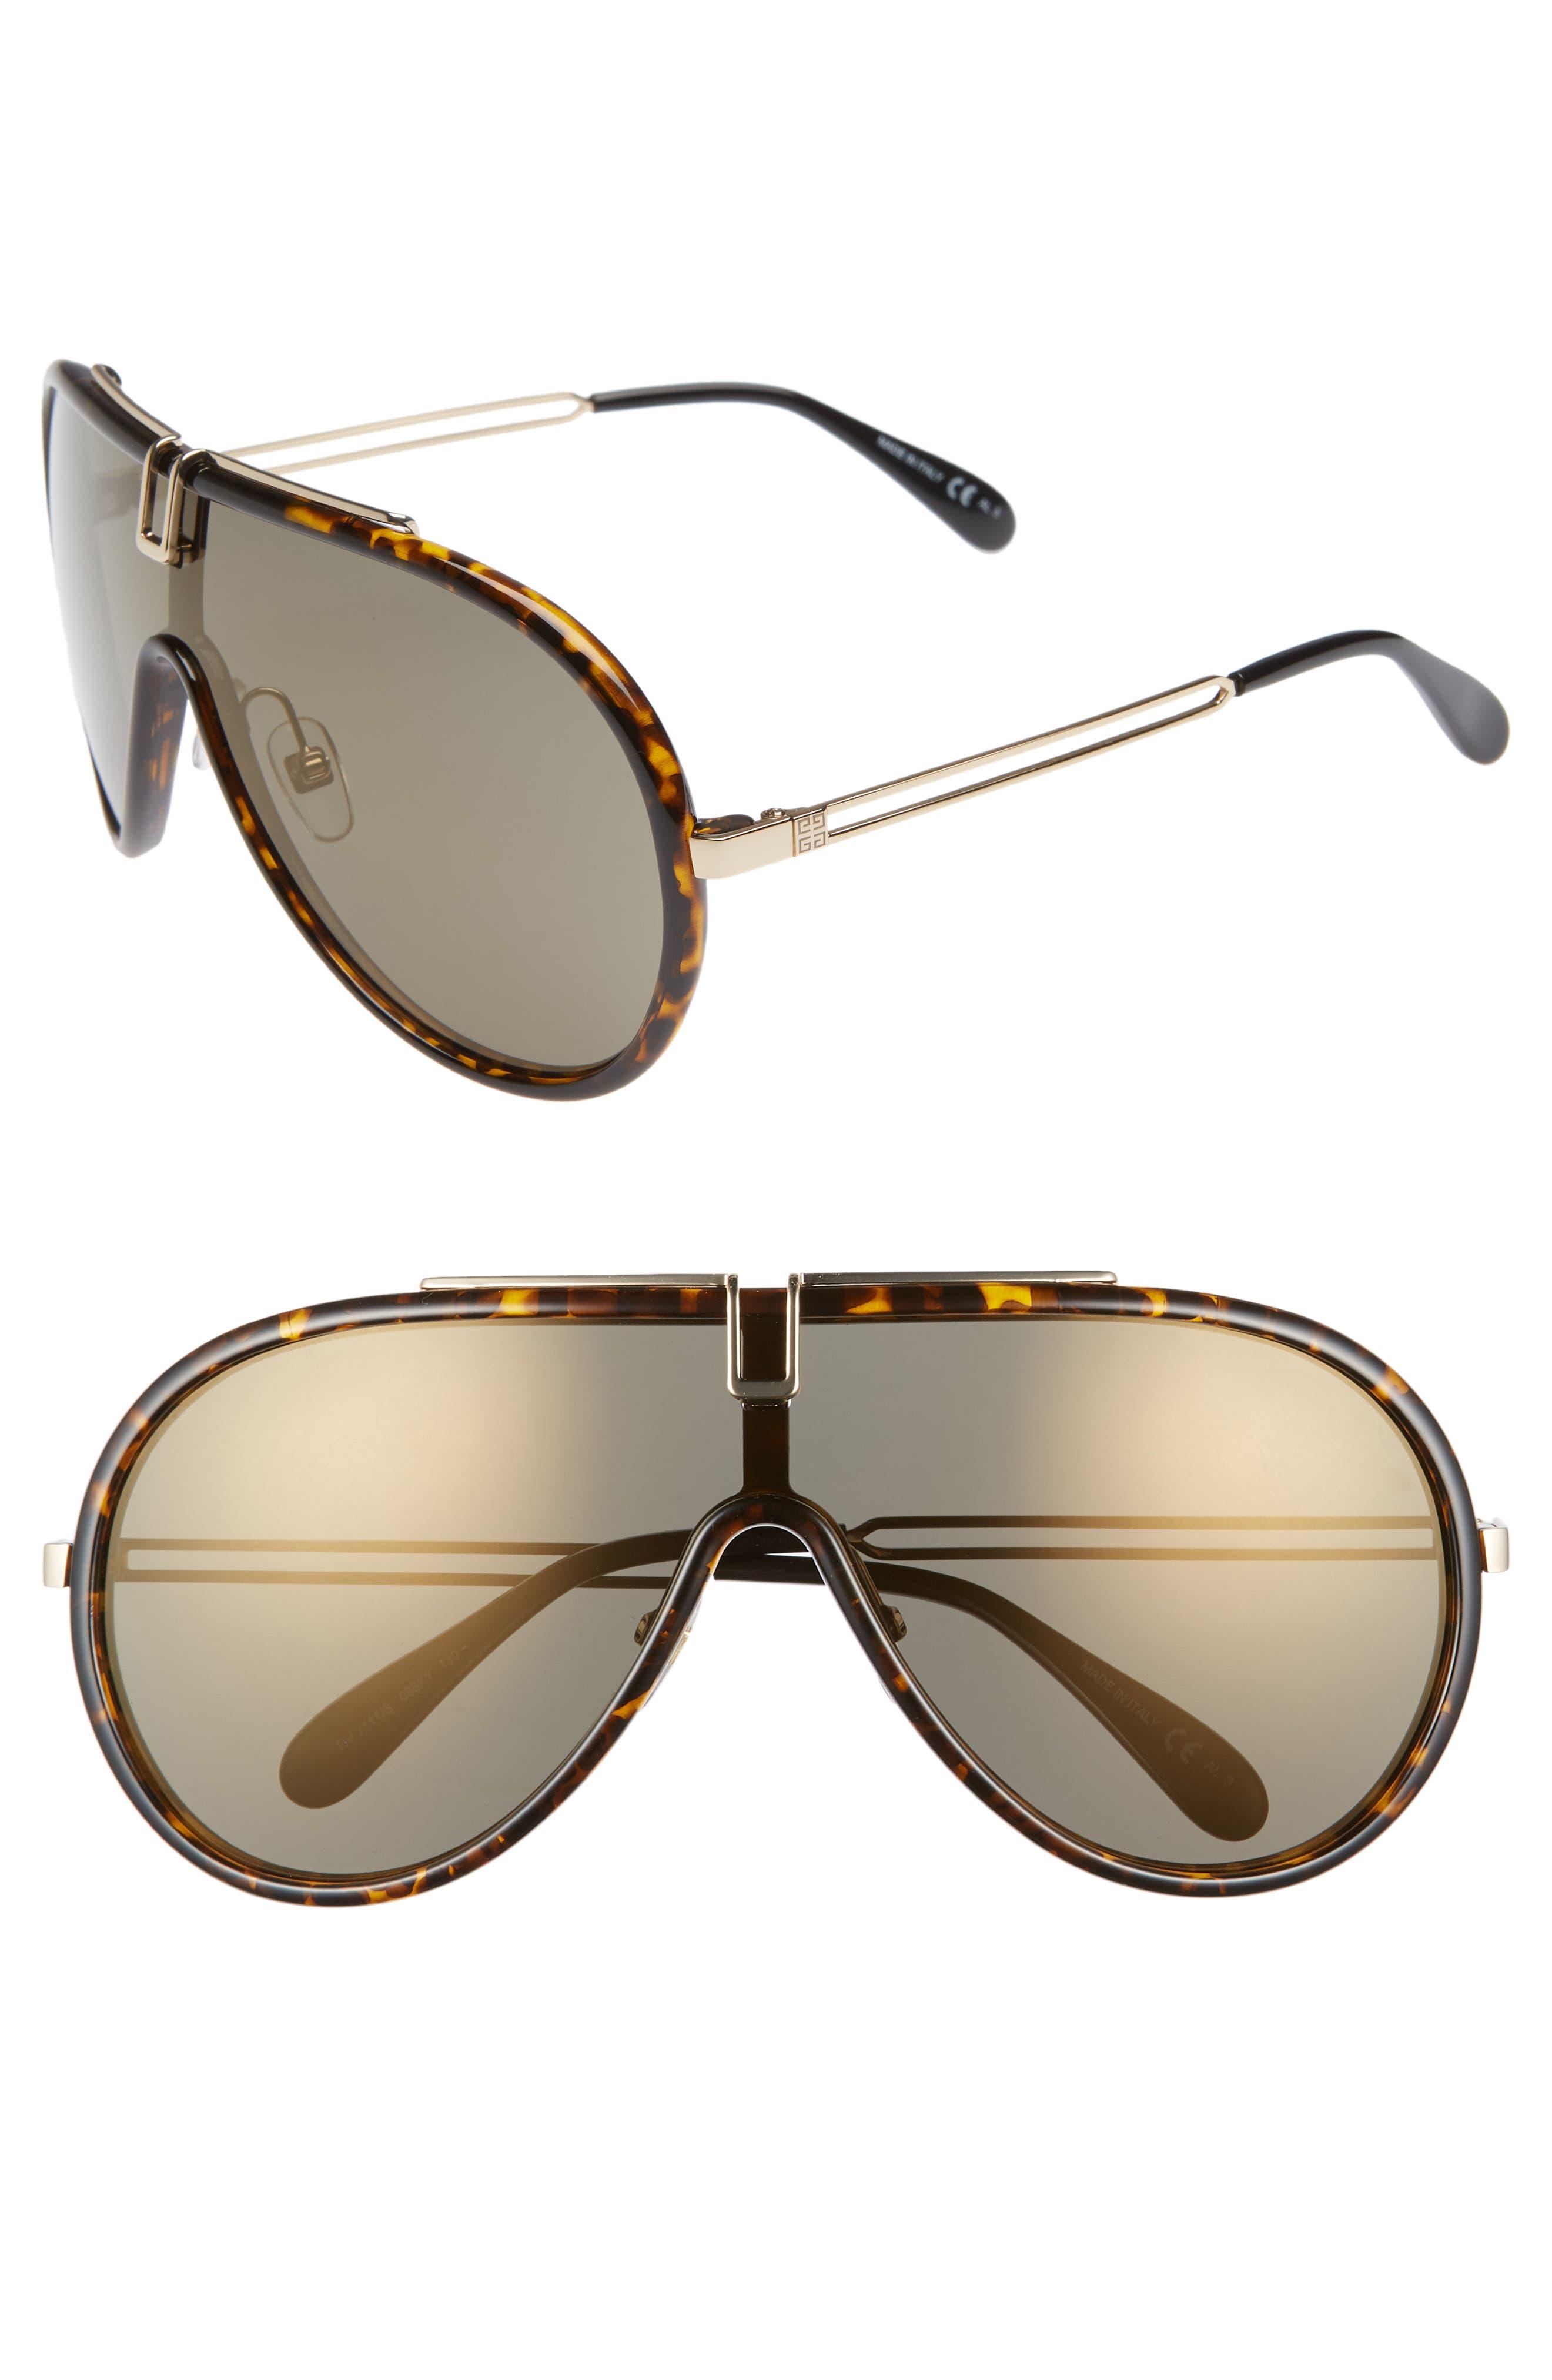 99mm Shield Sunglasses,                             Main thumbnail 1, color,                             DARK HAVANA